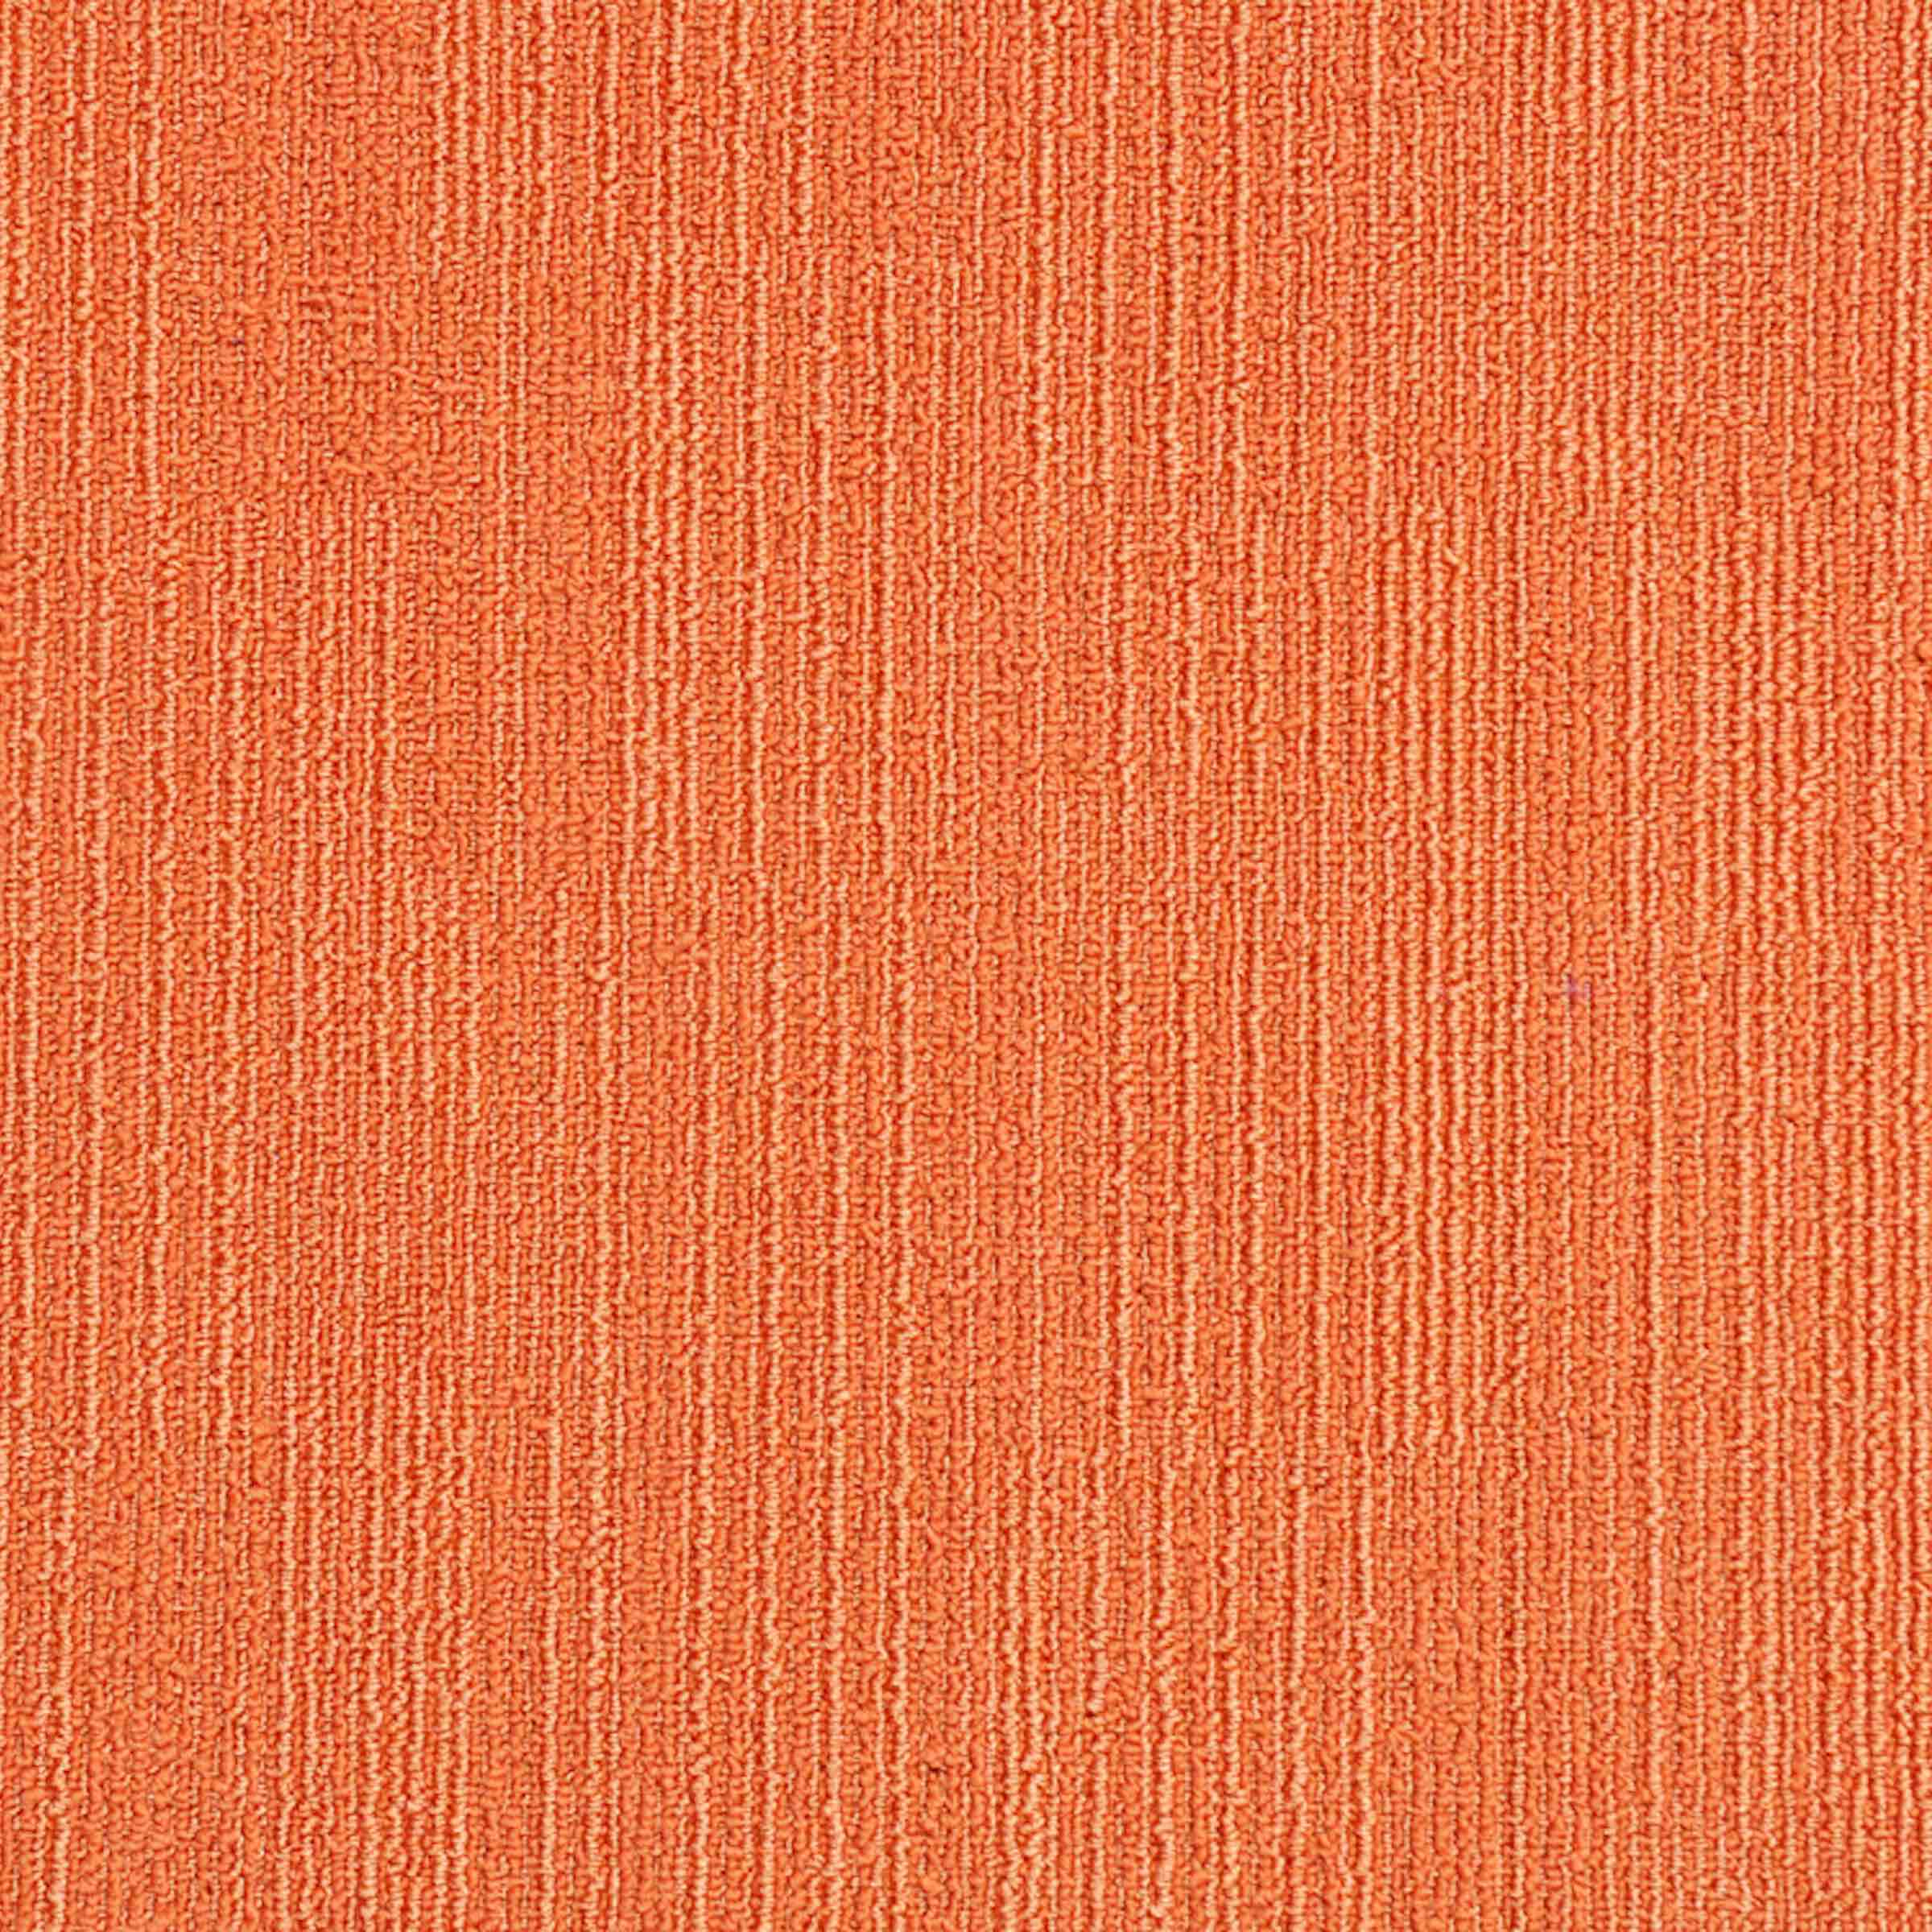 Highlights 3 Multi-Level | 33753 | Paragon Carpet Tiles | Commercial Carpet Tiles